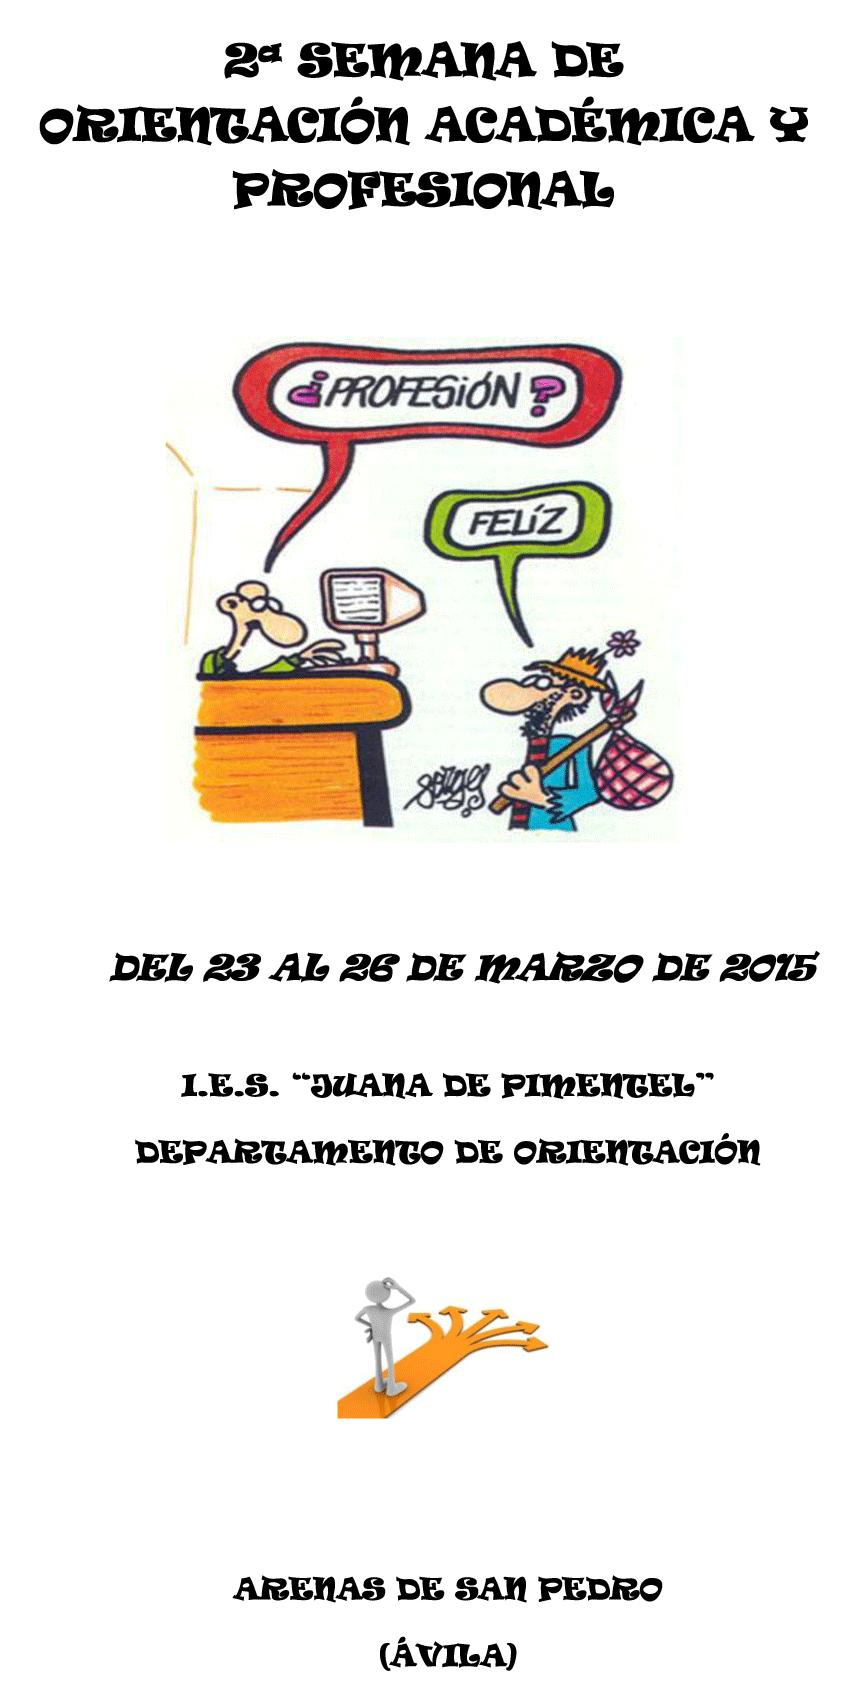 II Semana de Orientación Profesional del IES Juana de Pimentel de Arenas de San Pedro - TiétarTeVe